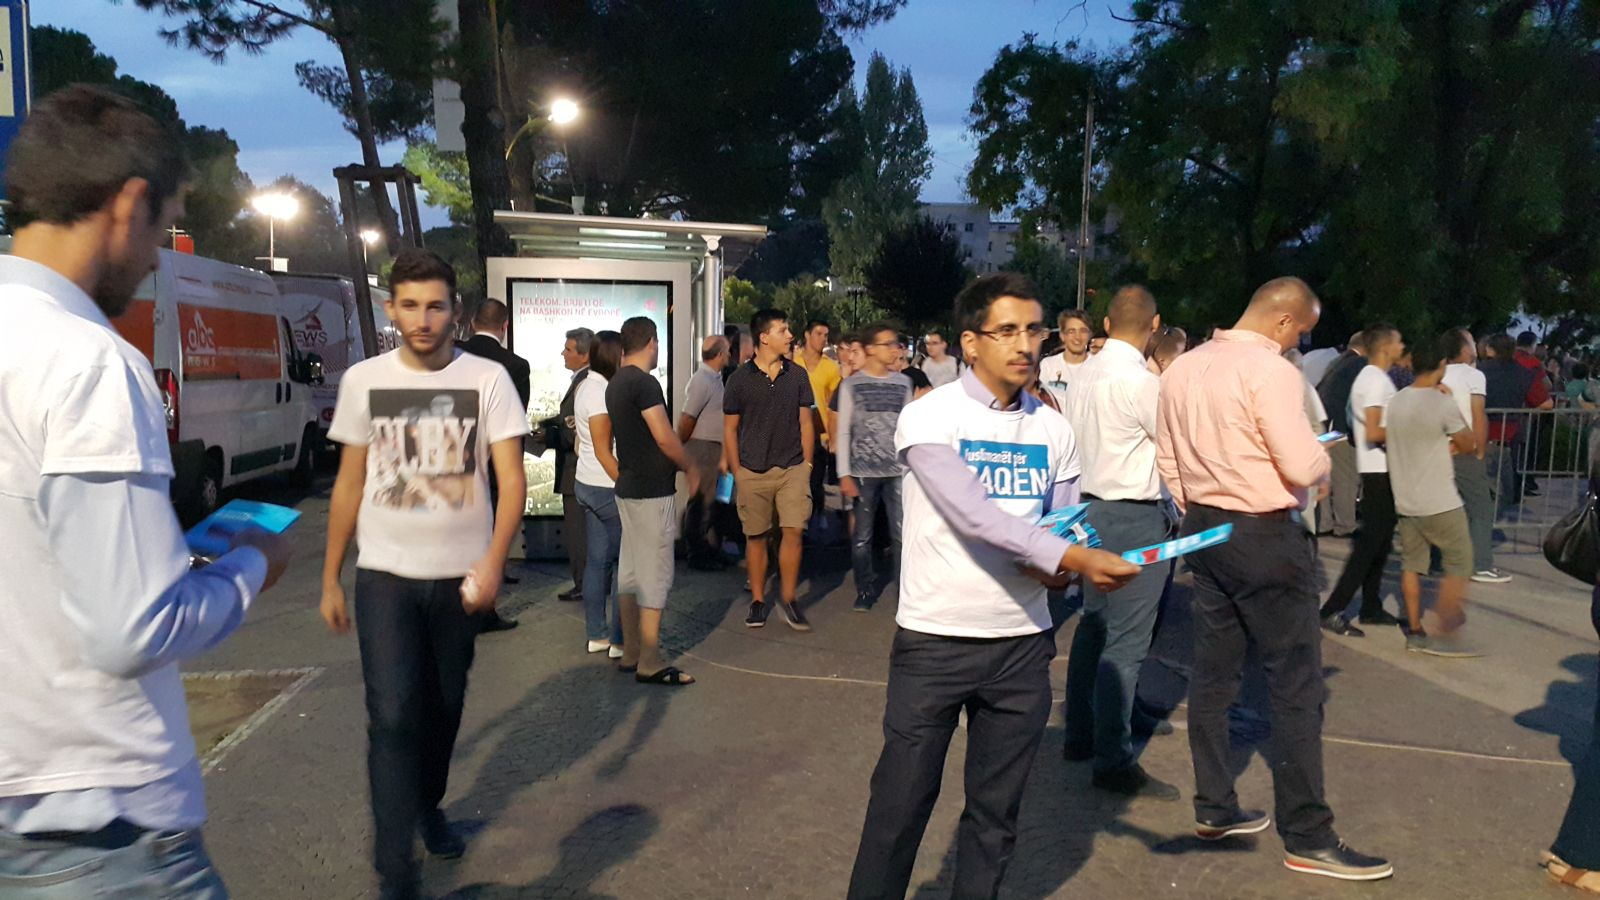 2015-09-08-AL-Tirana-shperndarja-e-fletushkes-per-paqen-006.jpg